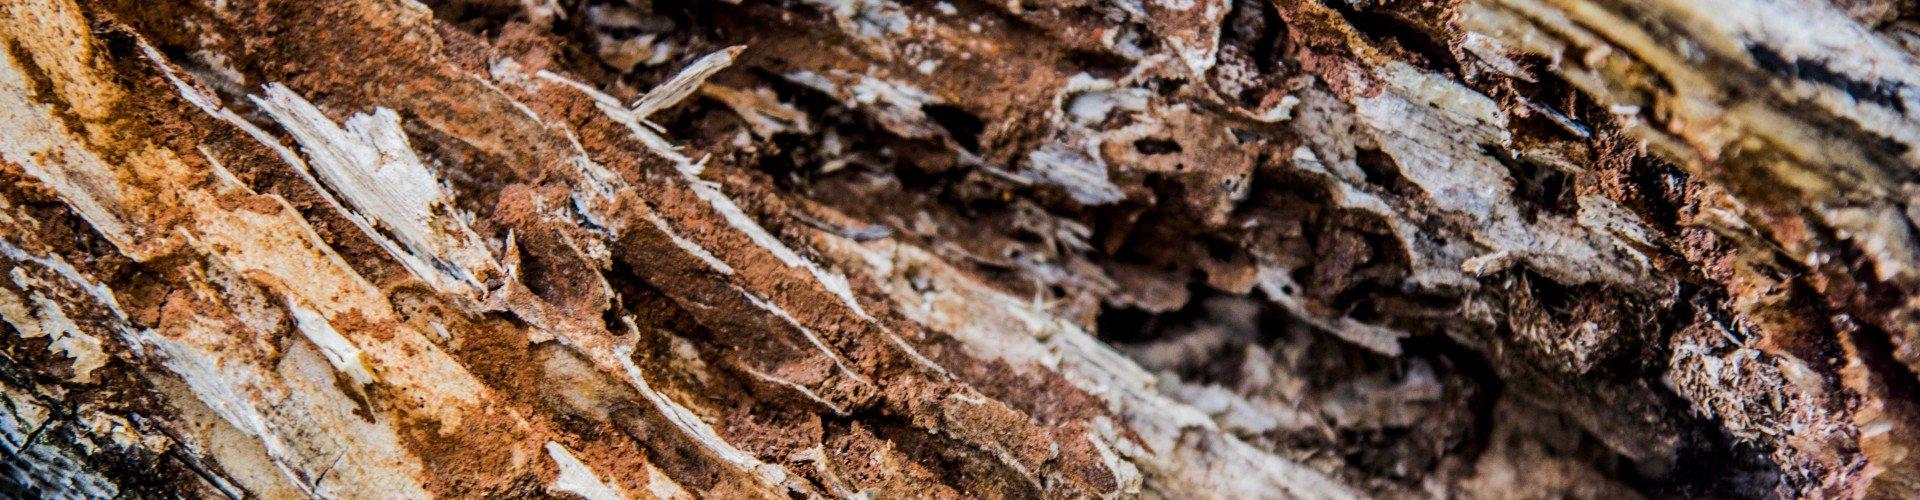 Africa's tree textures